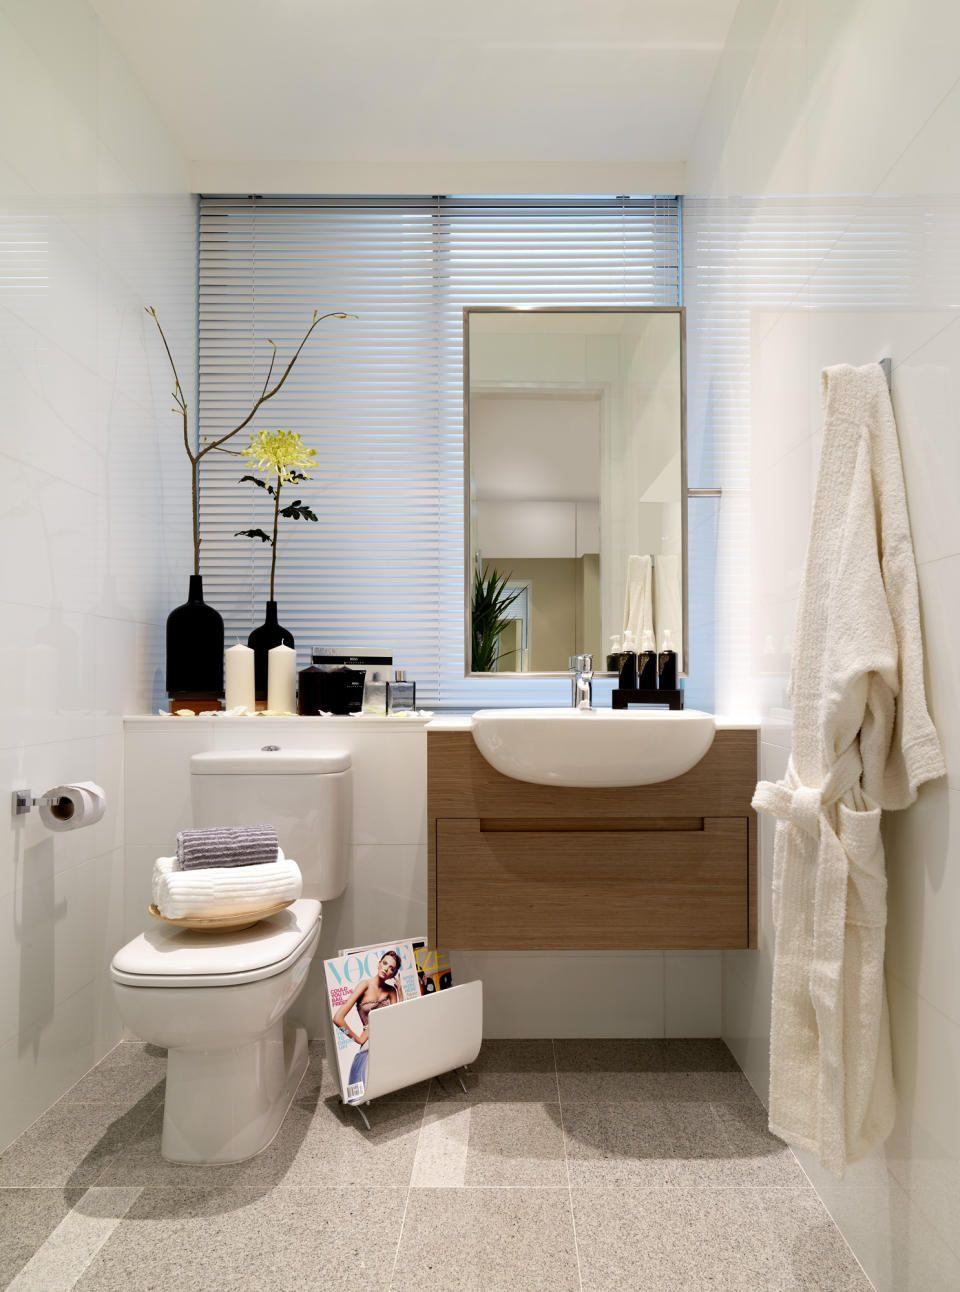 35 Best Contemporary Bathroom Design Ideas Simple Bathroom Designs Small Bathroom Layout Bathroom Design Small